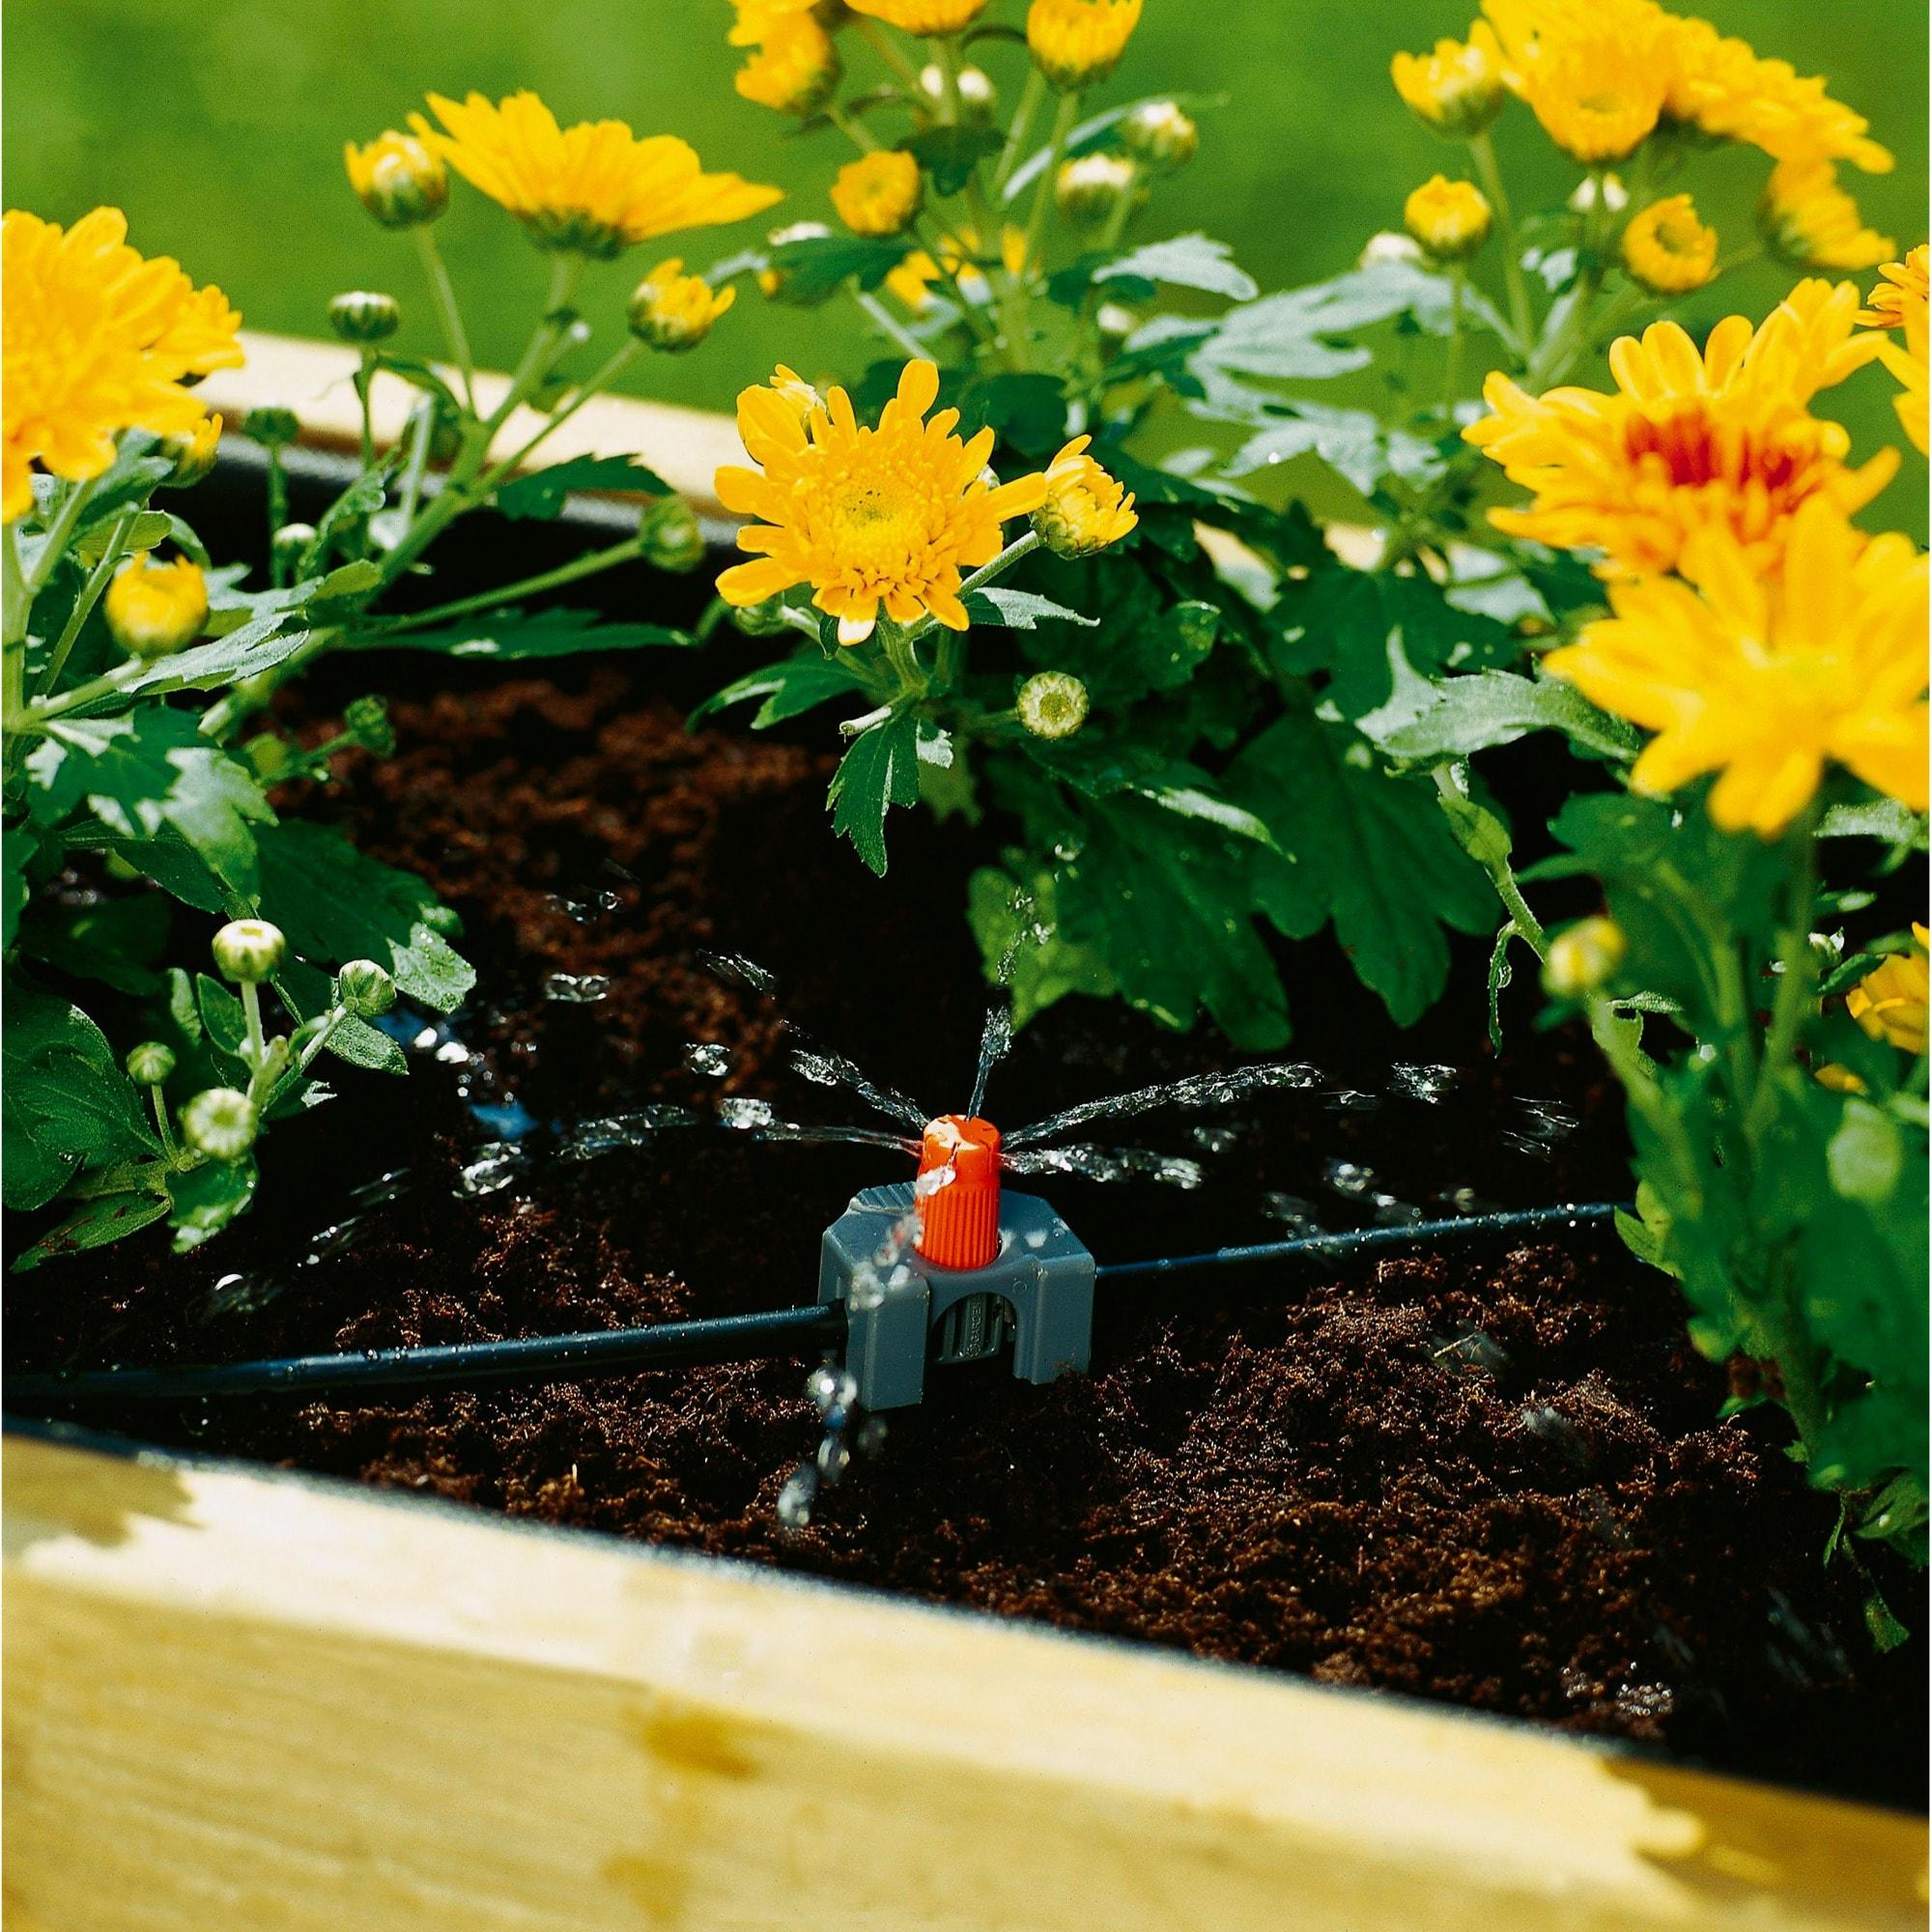 Gardena Sprinklersystem Kleinflächendüse